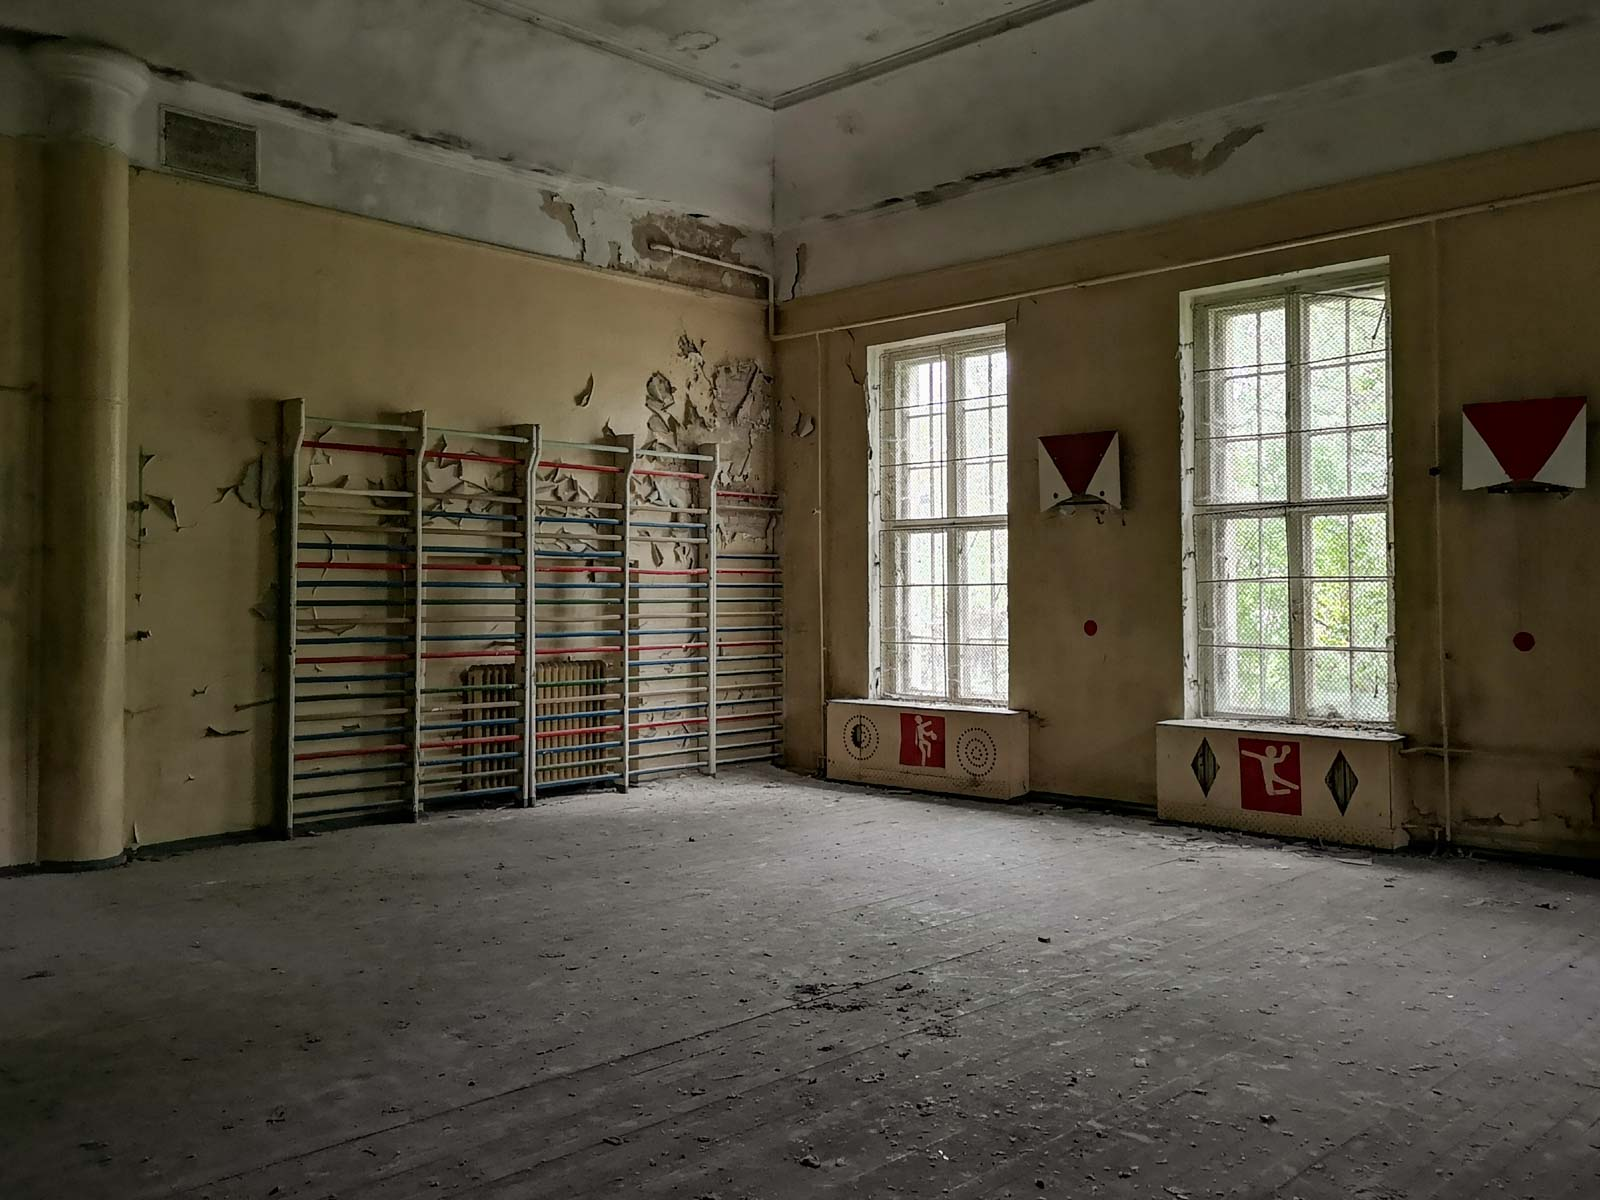 Sportraum in verlassener sowjetischer Schule Brandenburg